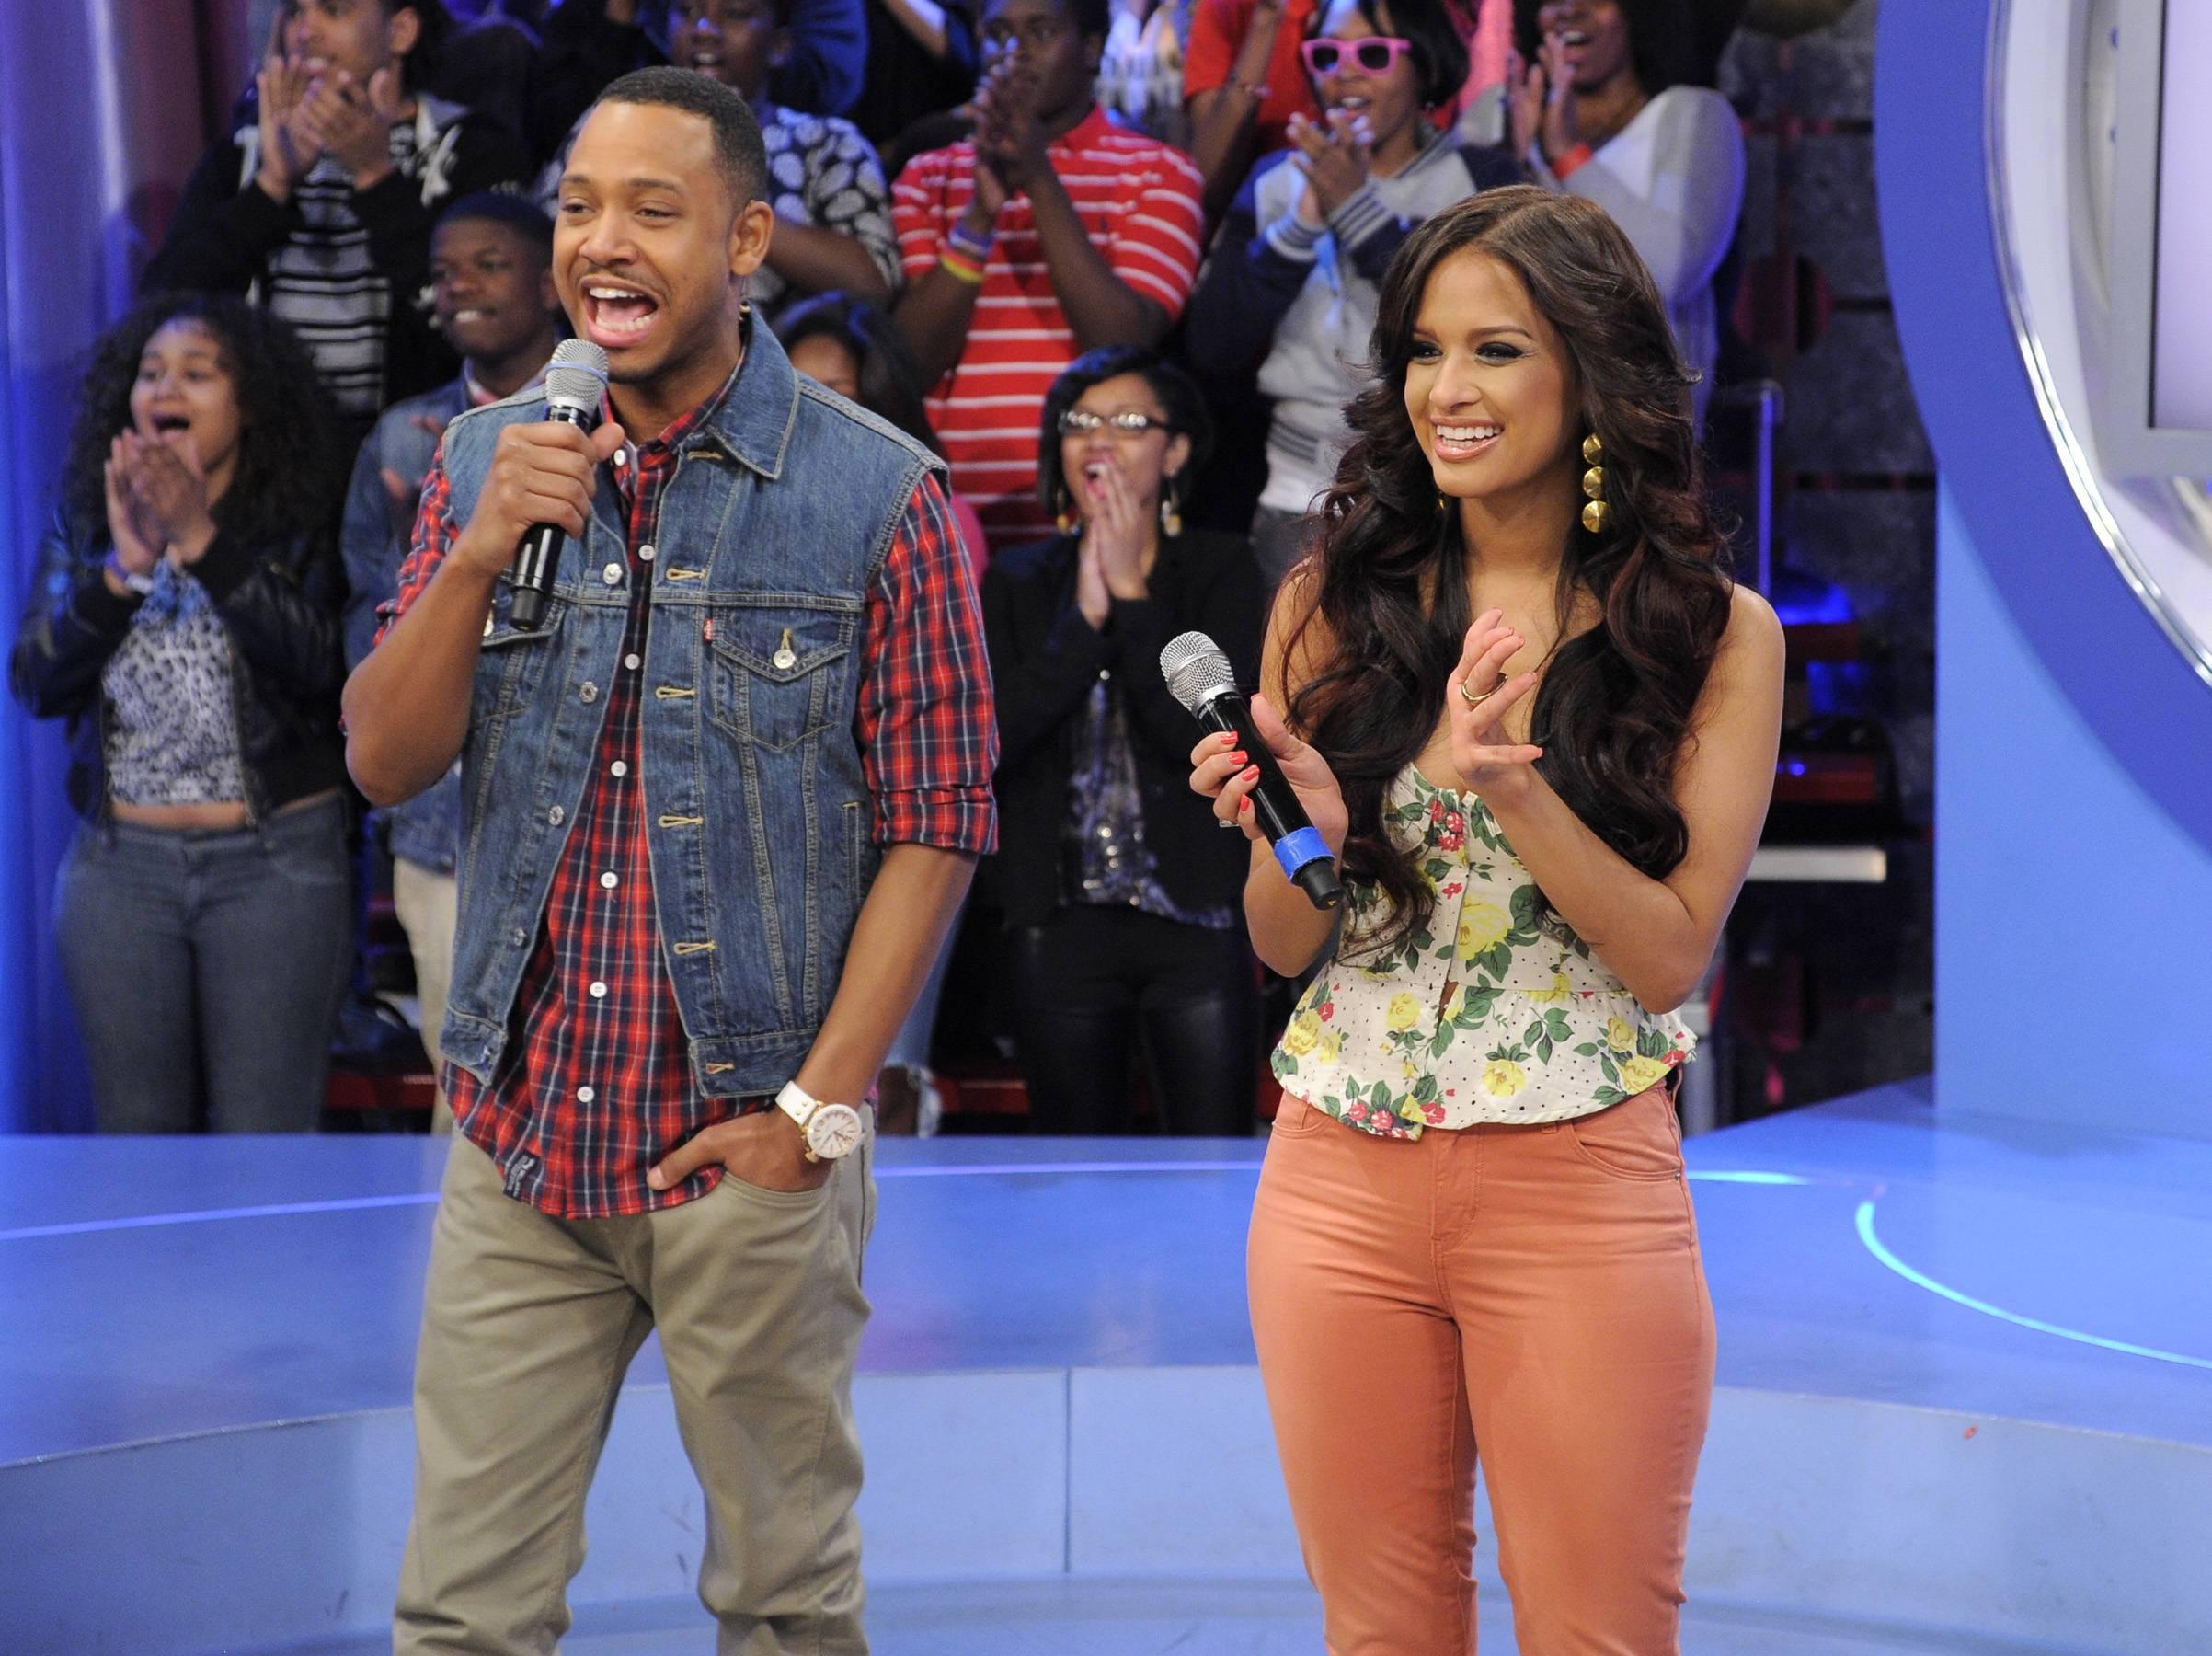 Surprised - Rocsi Diaz and Terrence J at 106 & Park, April 20, 2012. (Photo: John Ricard / BET)